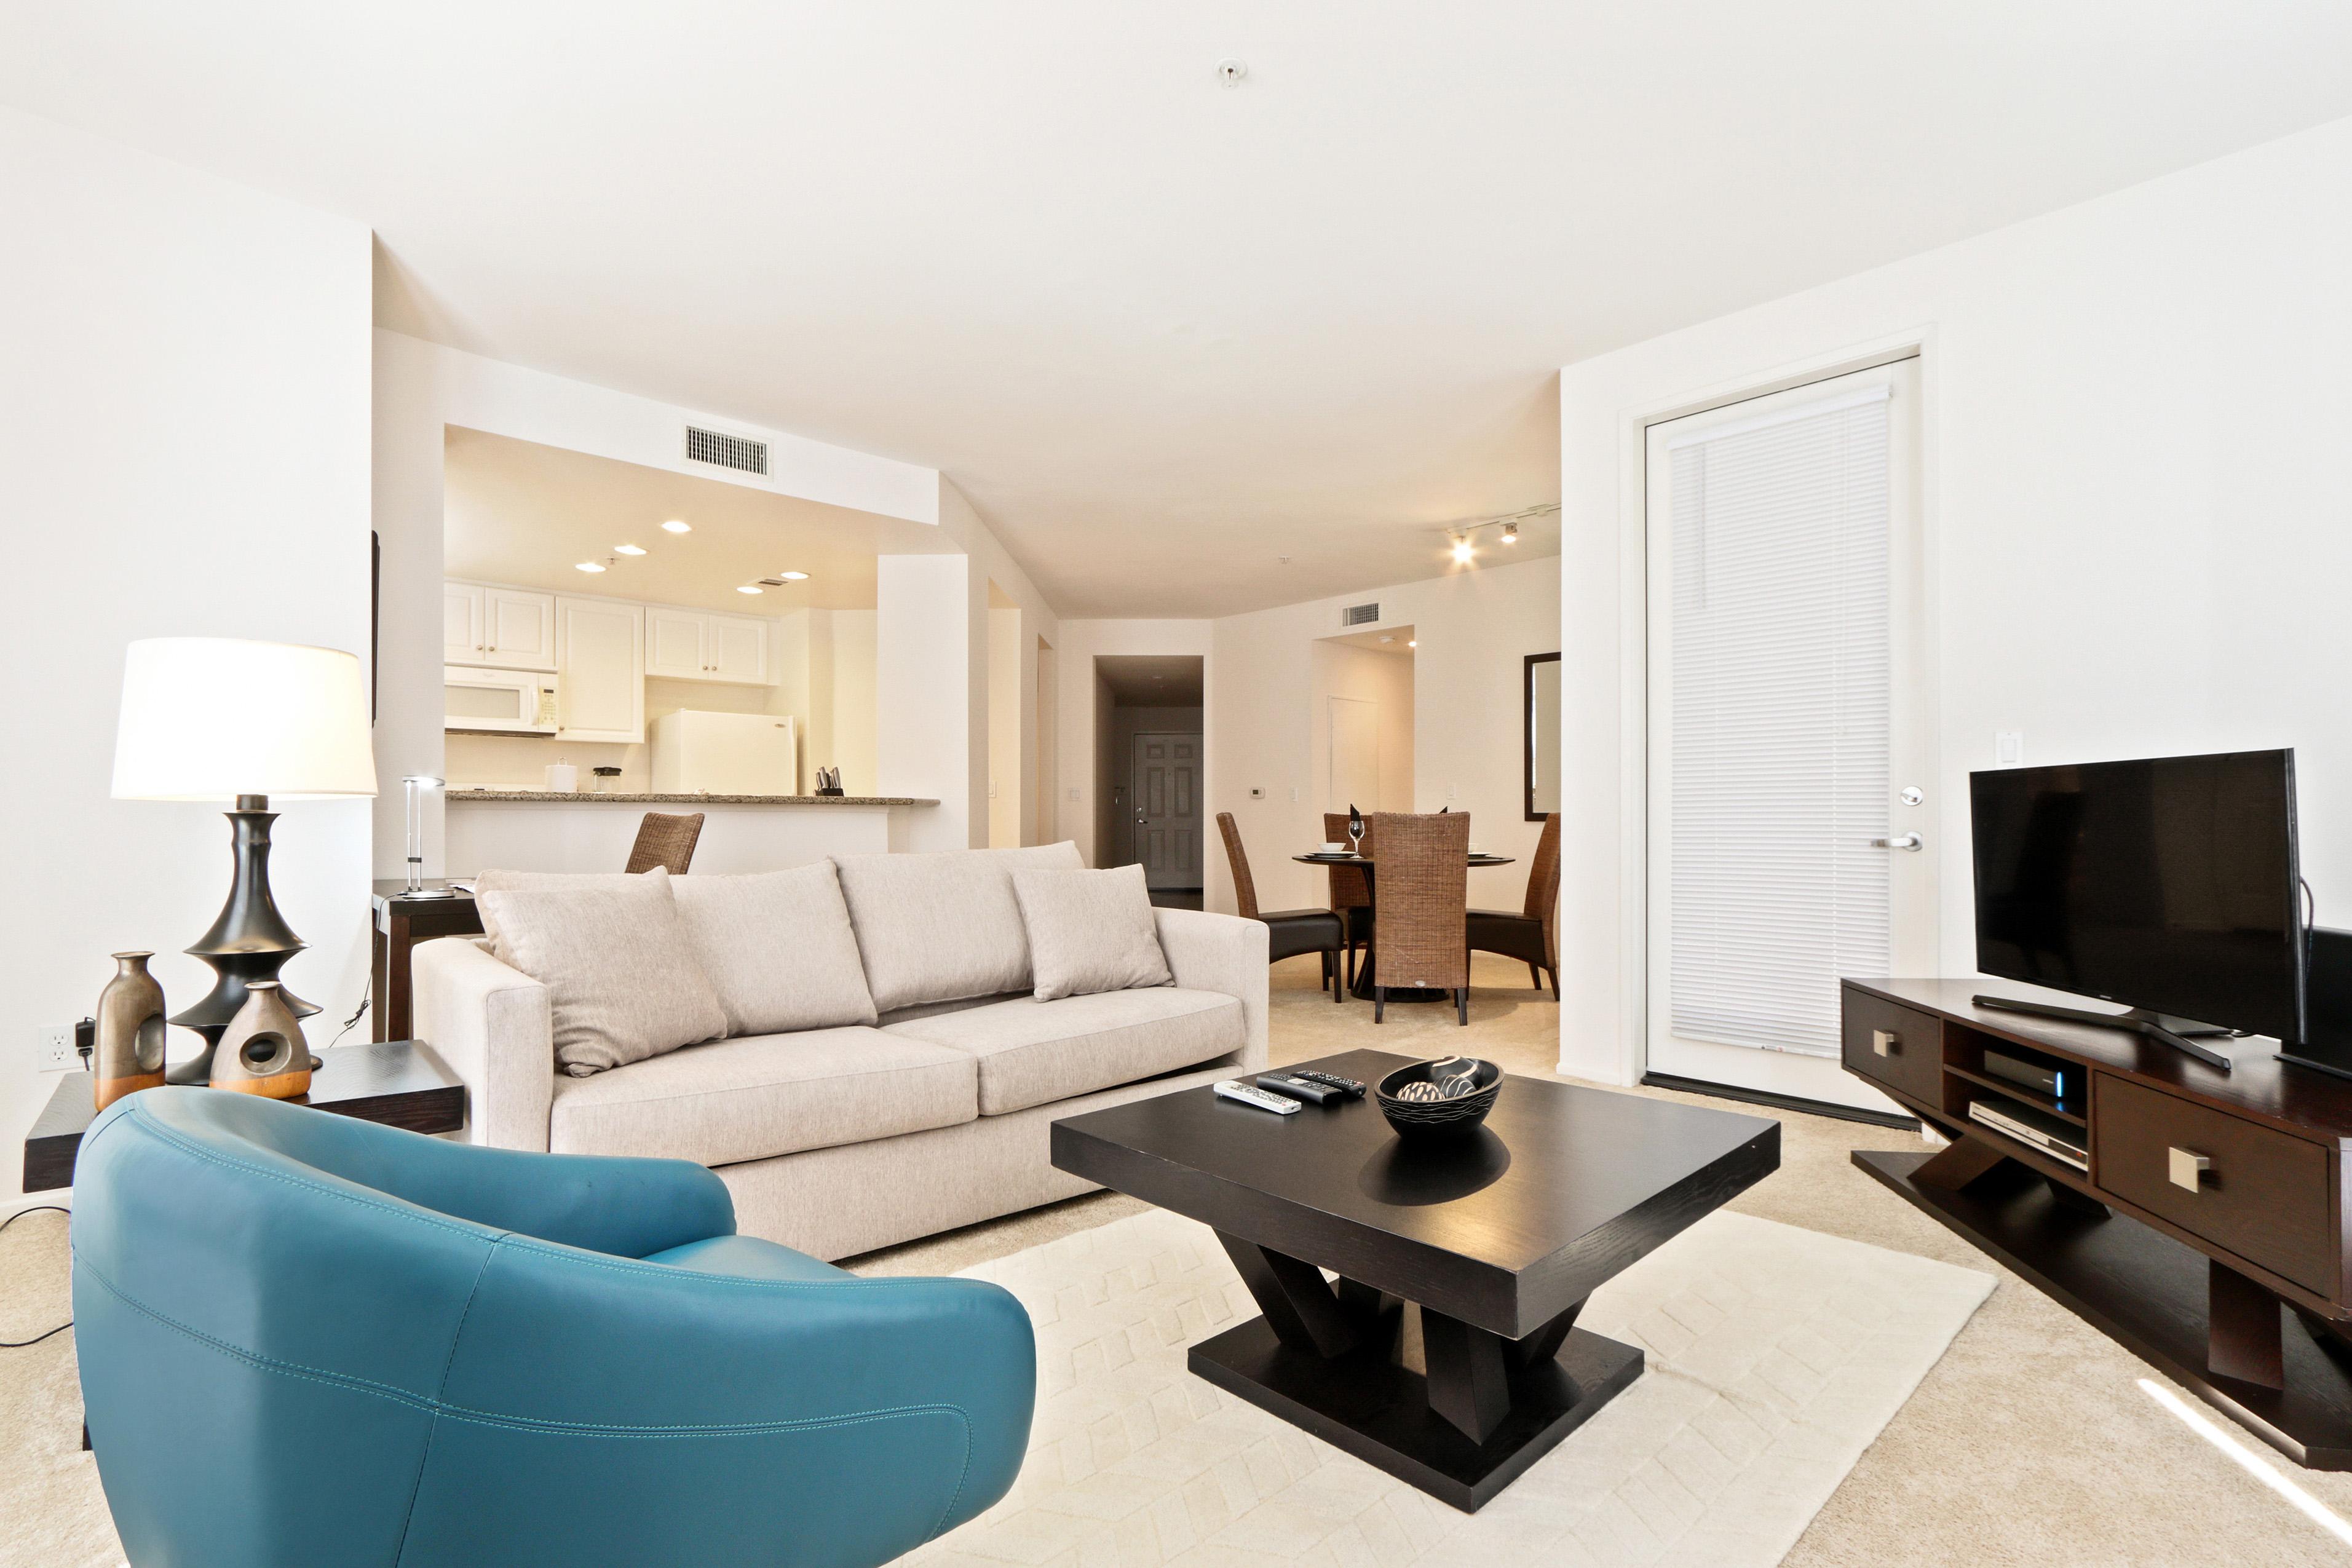 image 5 furnished 2 bedroom Apartment for rent in Irvine, Orange County